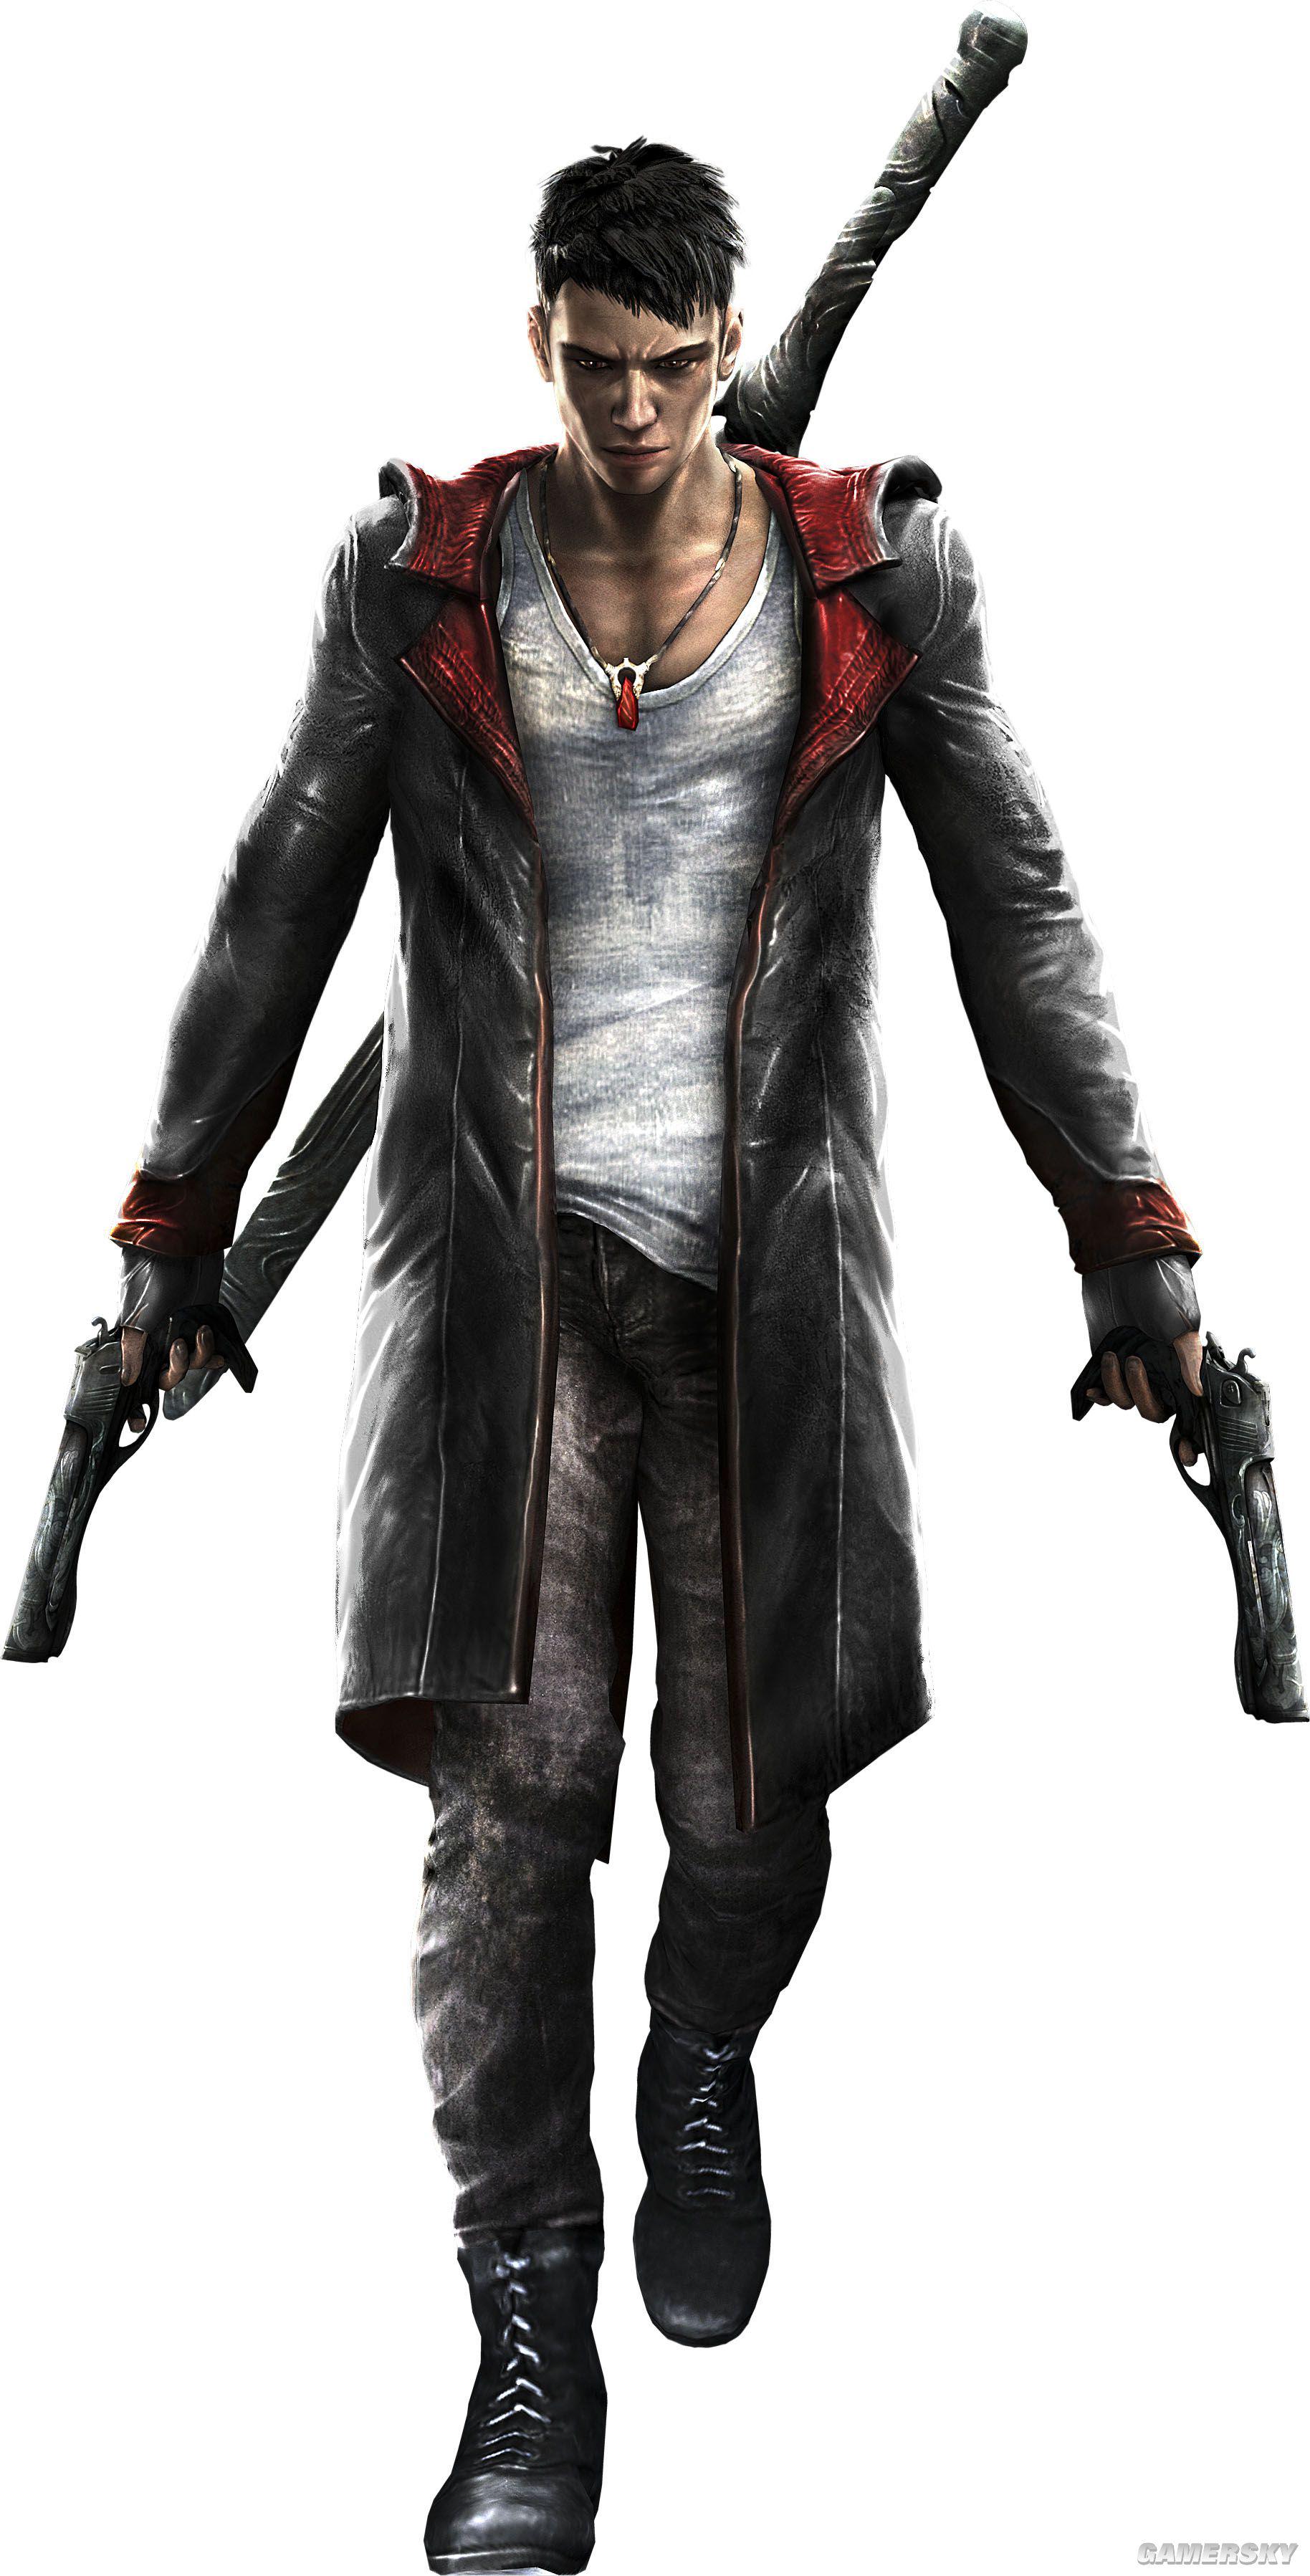 La Leyenda del Legendario Guerrero Espadachín [Dante ID] - Página 2 Dante.%28Ninja.Theory%29.full.1229552